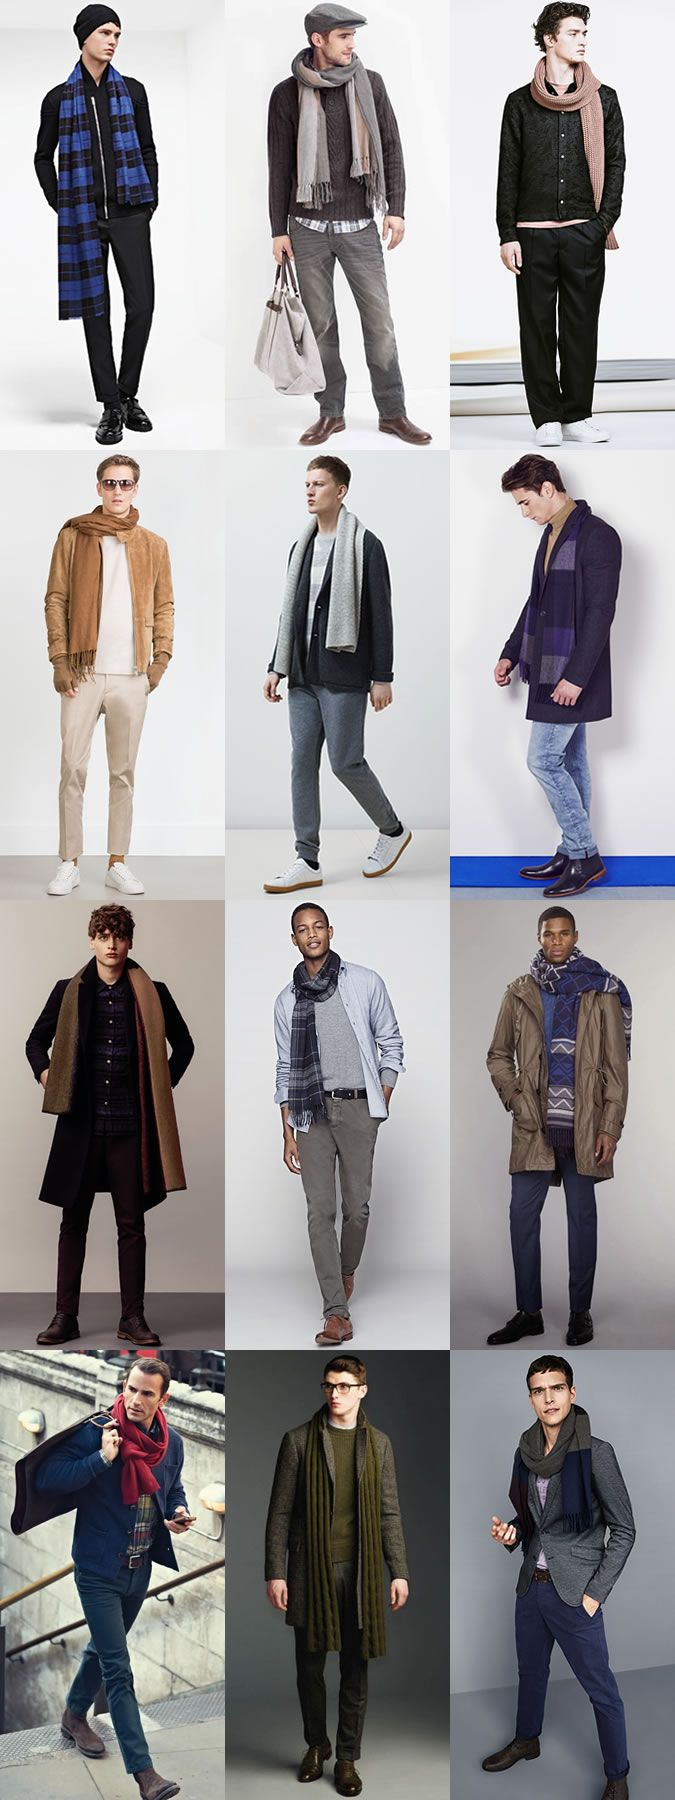 Men's Autumn/Winter Accessories: Scarves Autumn/Winter Outfit Inspiration Lookbook